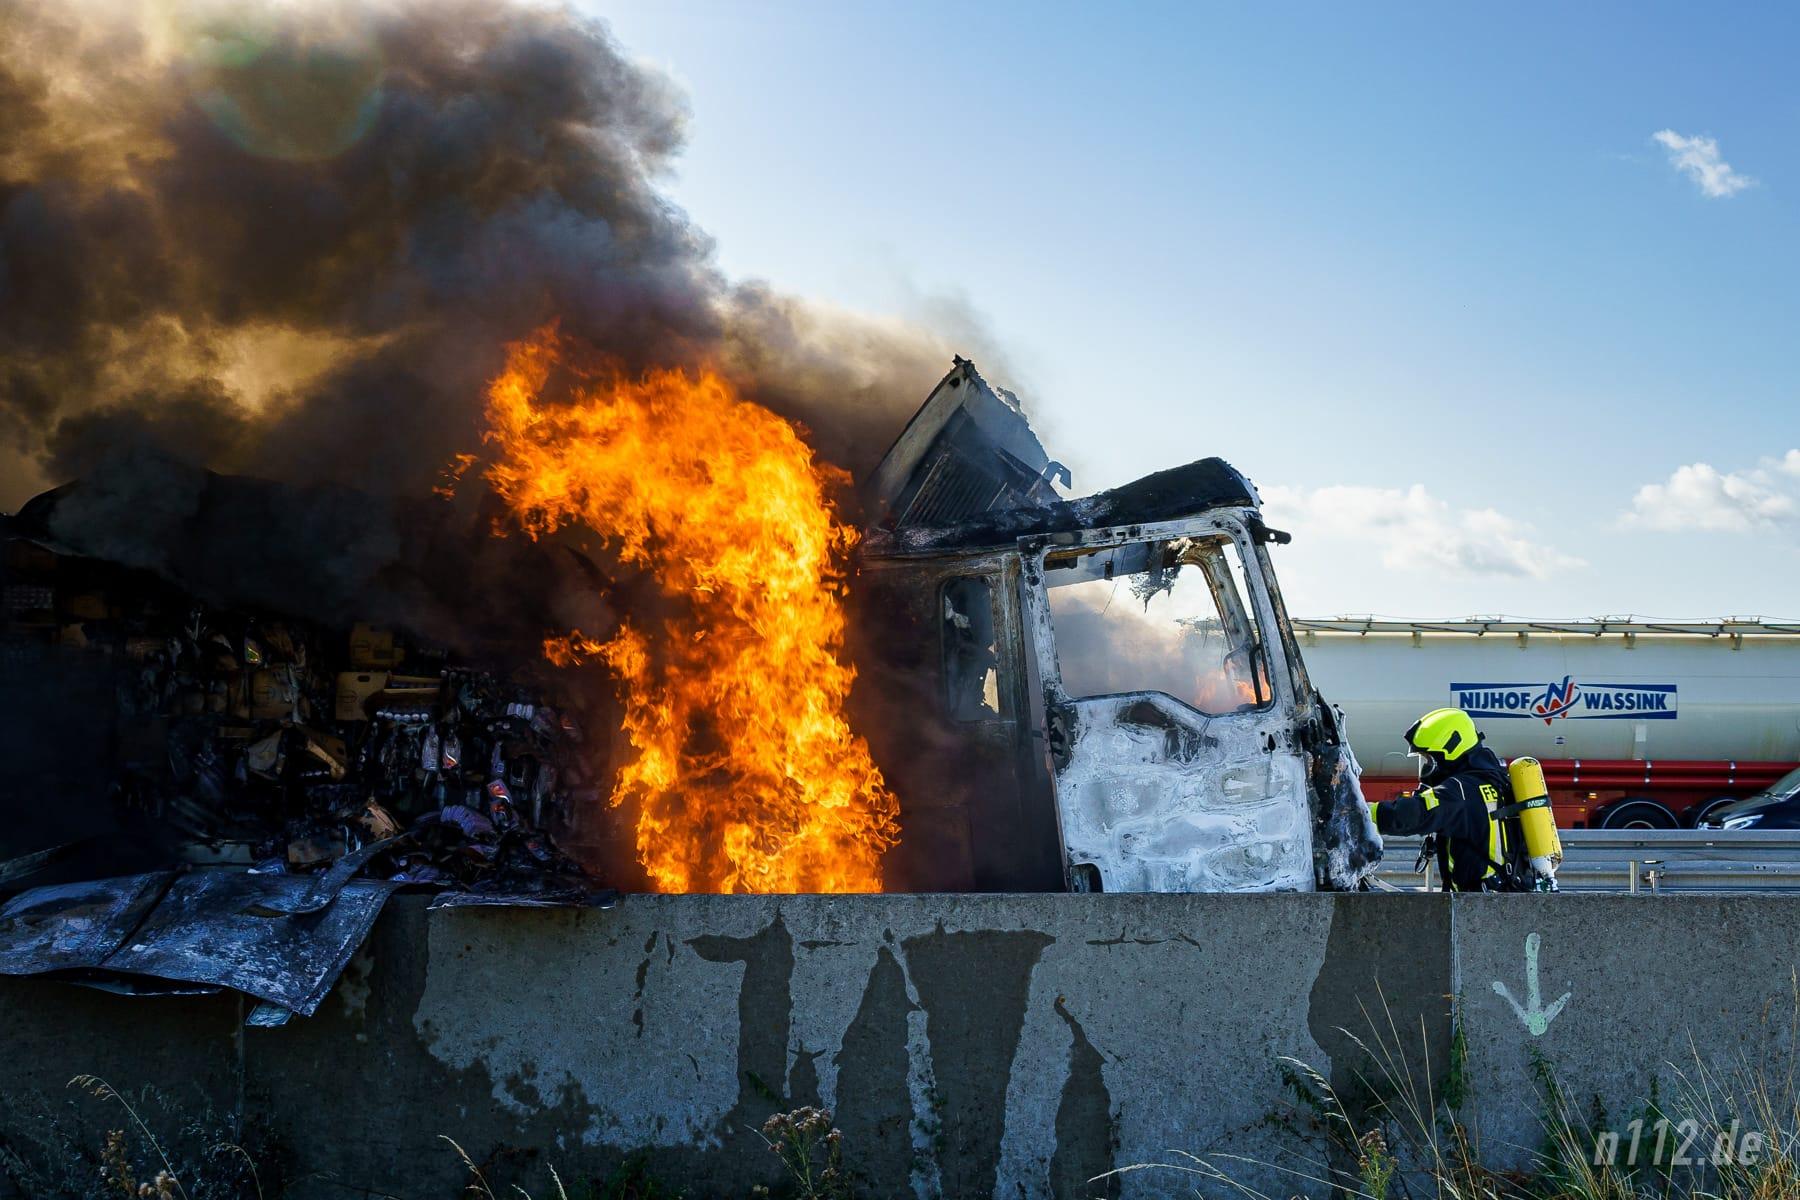 Hohe Flammen schlagen aus dem brennenden Lastwagen (Foto: n112.de/Stefan Simonsen)